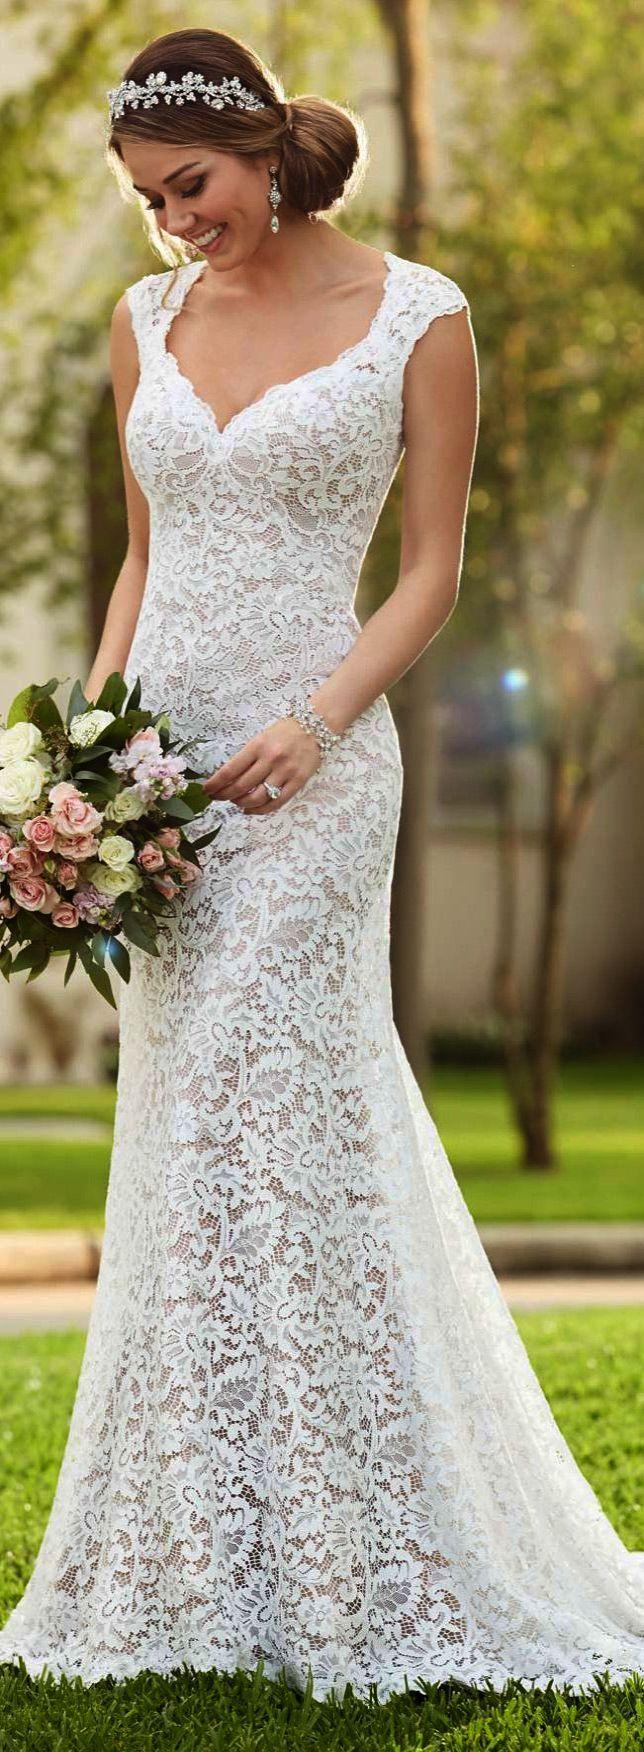 Neat ue lace princess cut wedding dress twitter wedding dresses